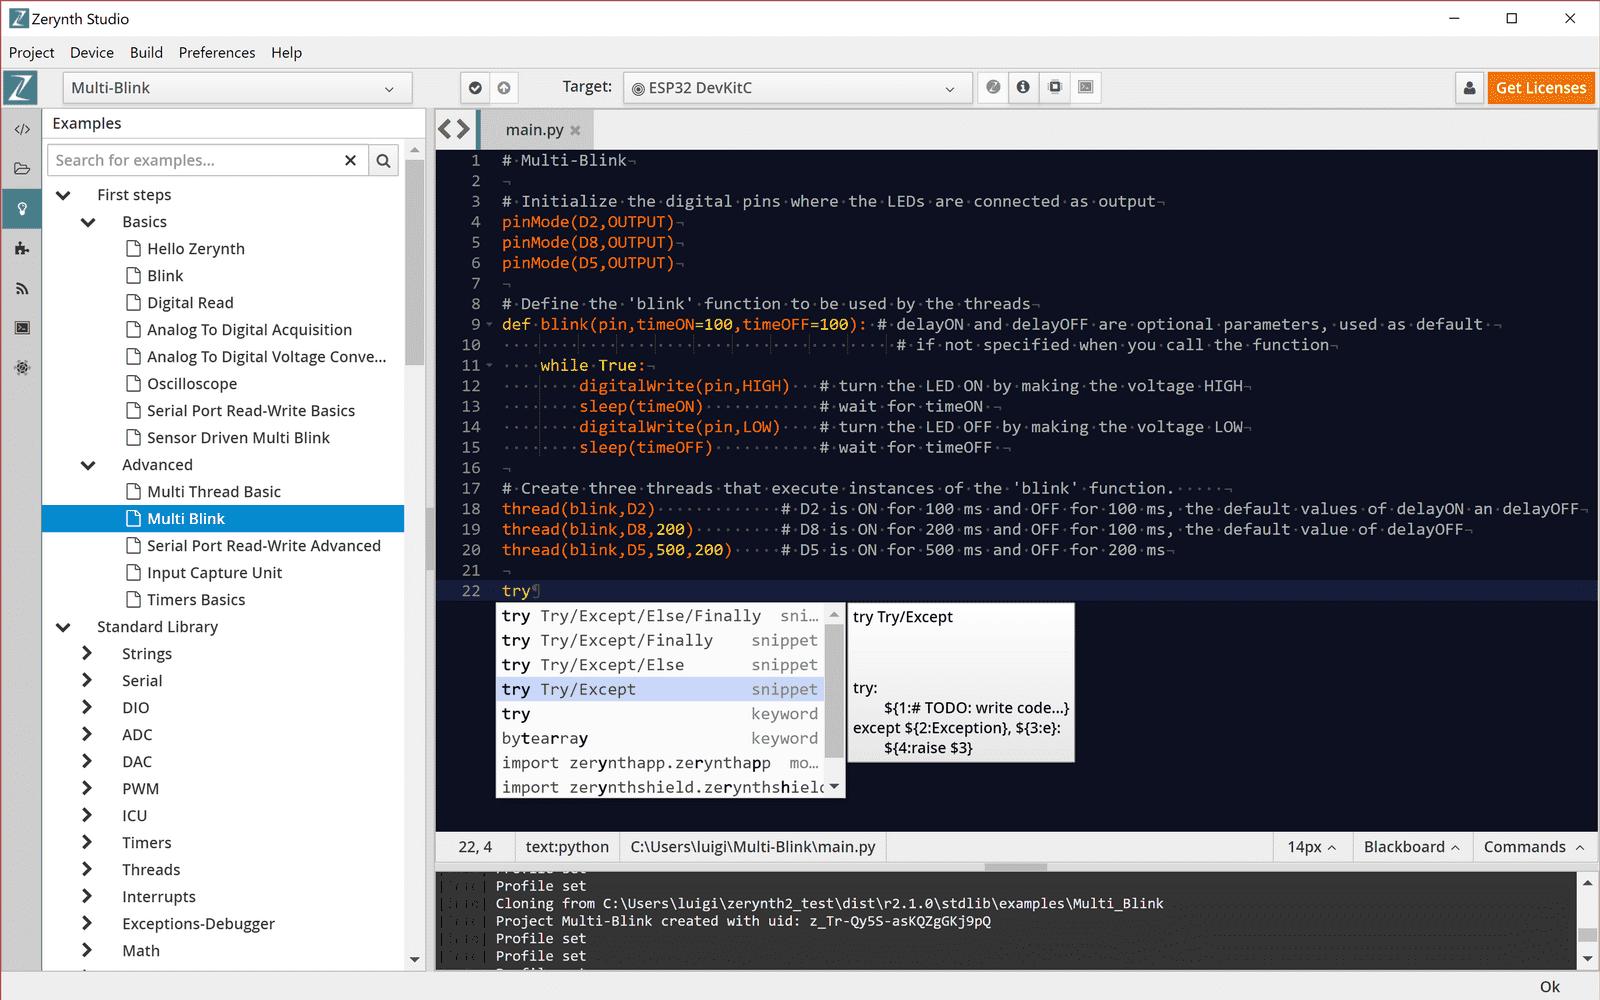 Zerynth Studio - A powerful IDE for embedded programming